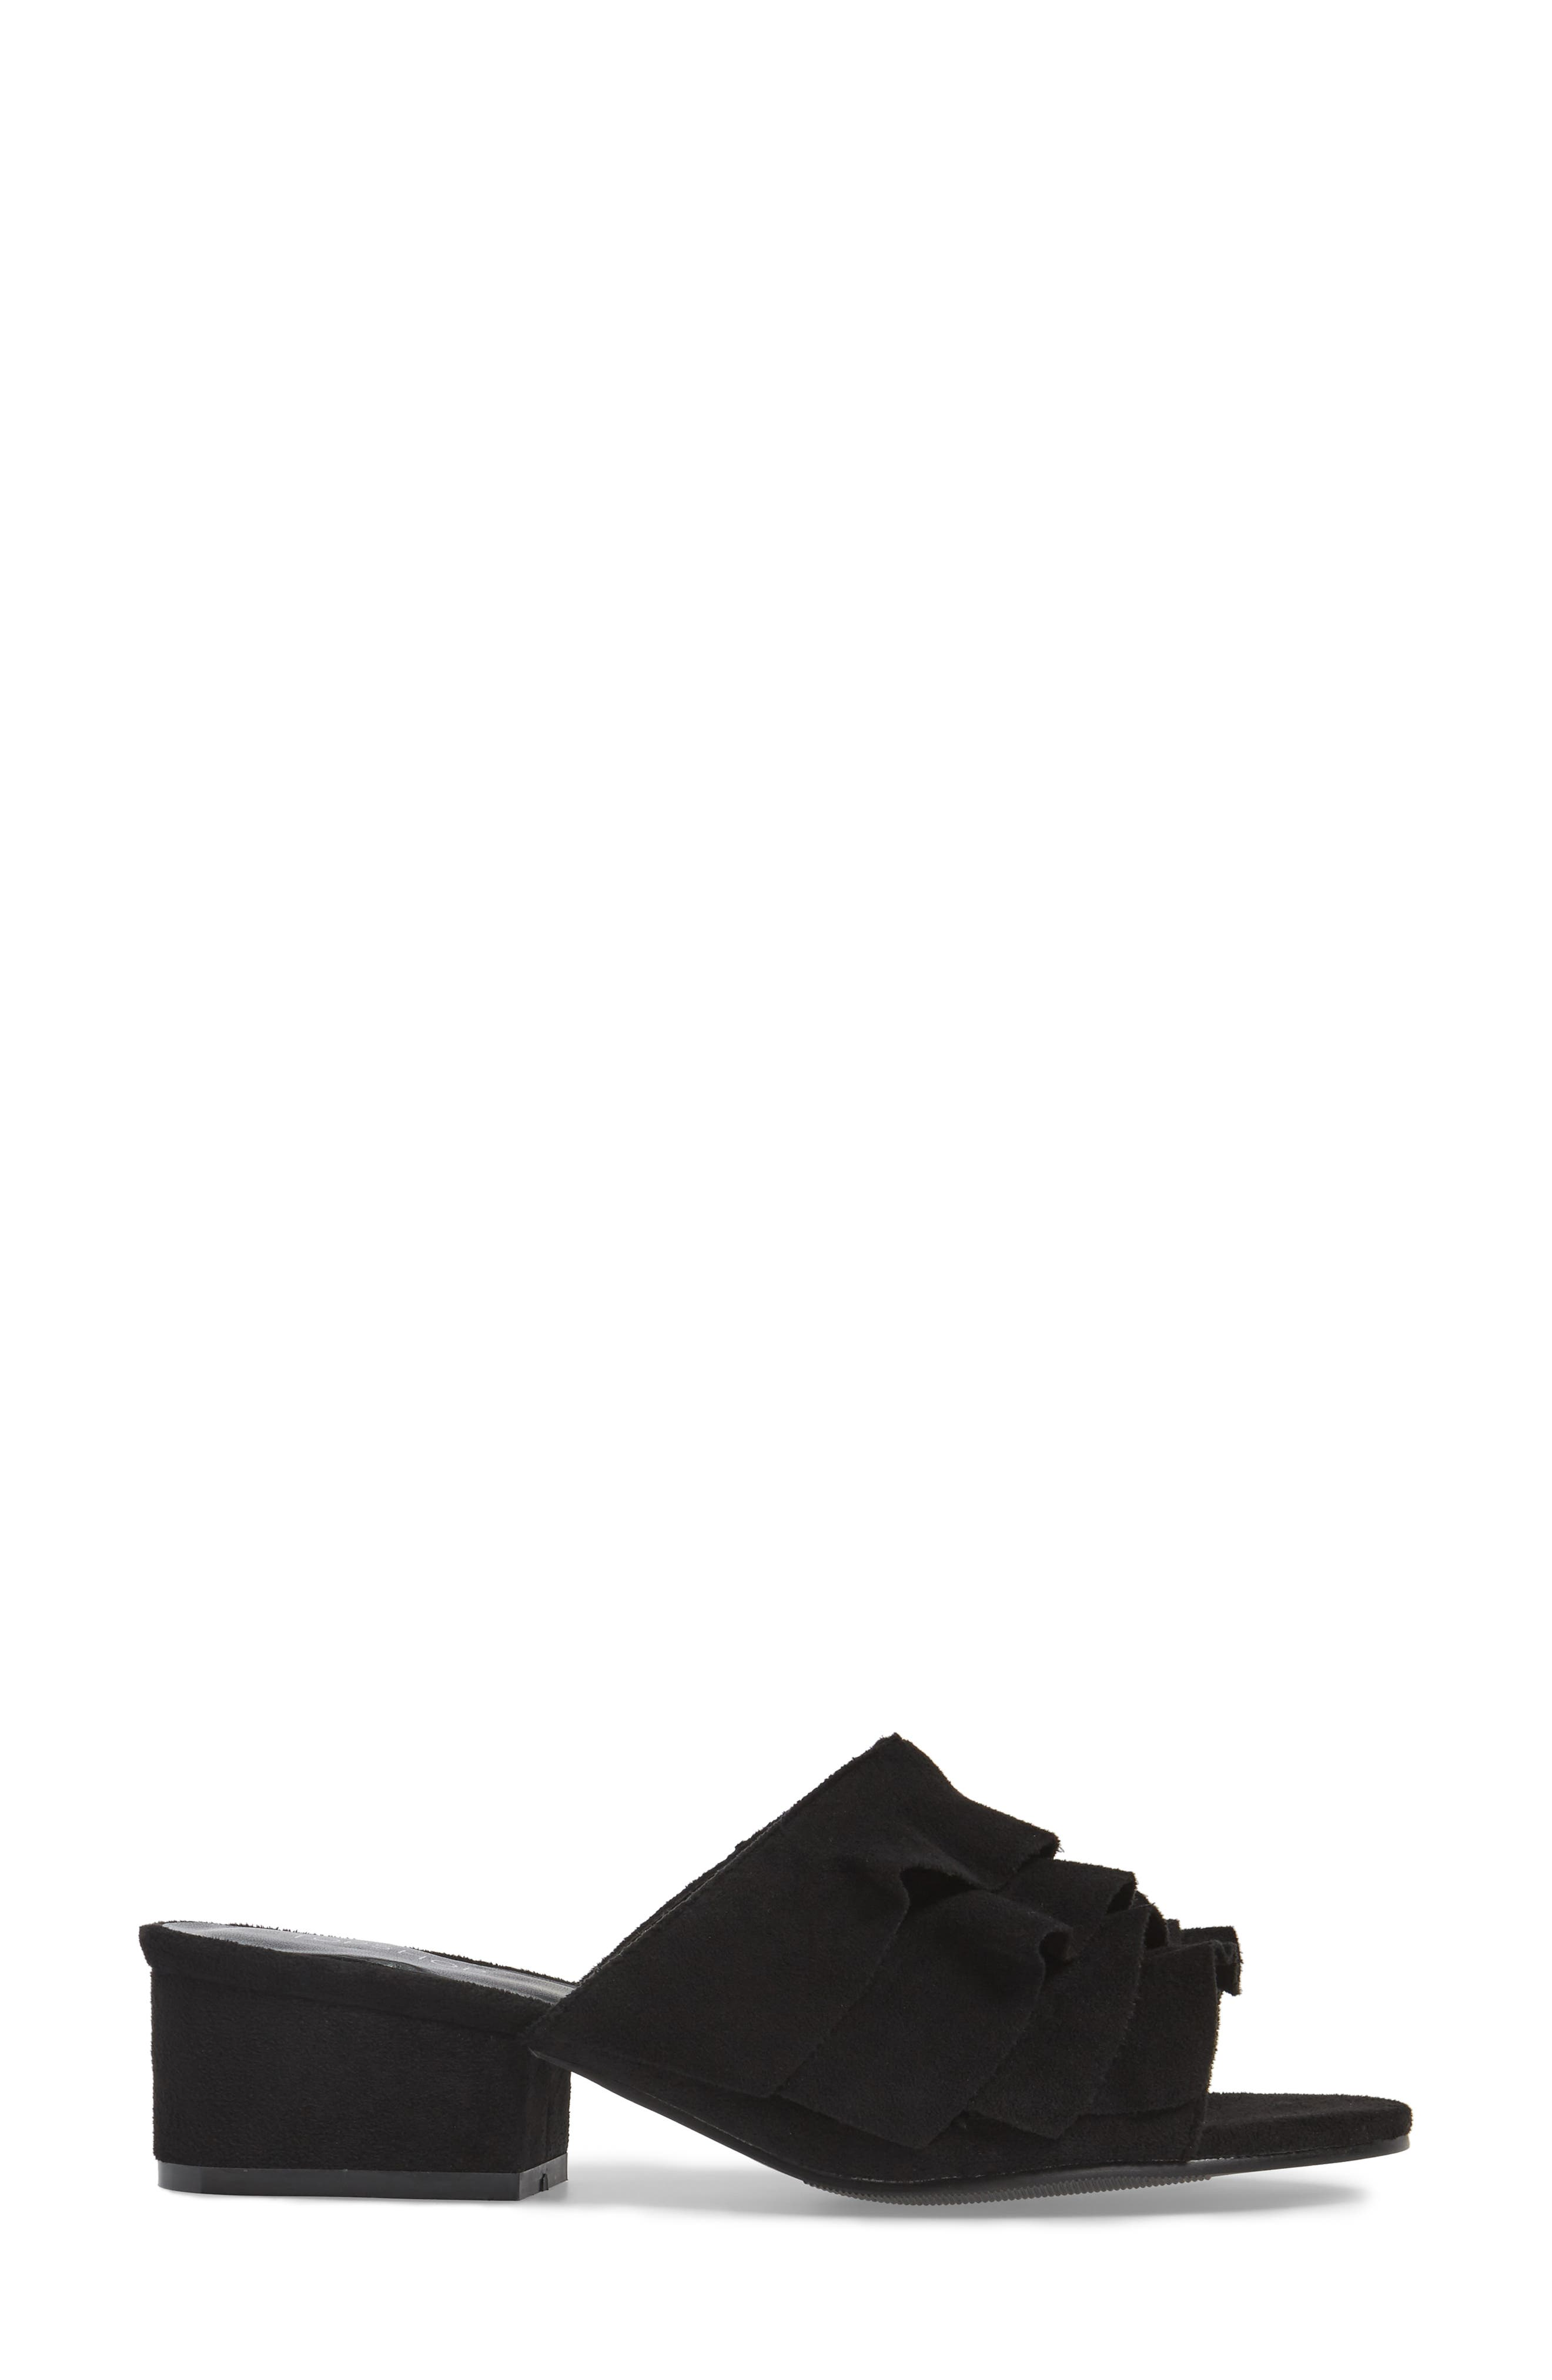 Alternate Image 3  - Topshop Darcy Ruffle Slide Sandal (Women)